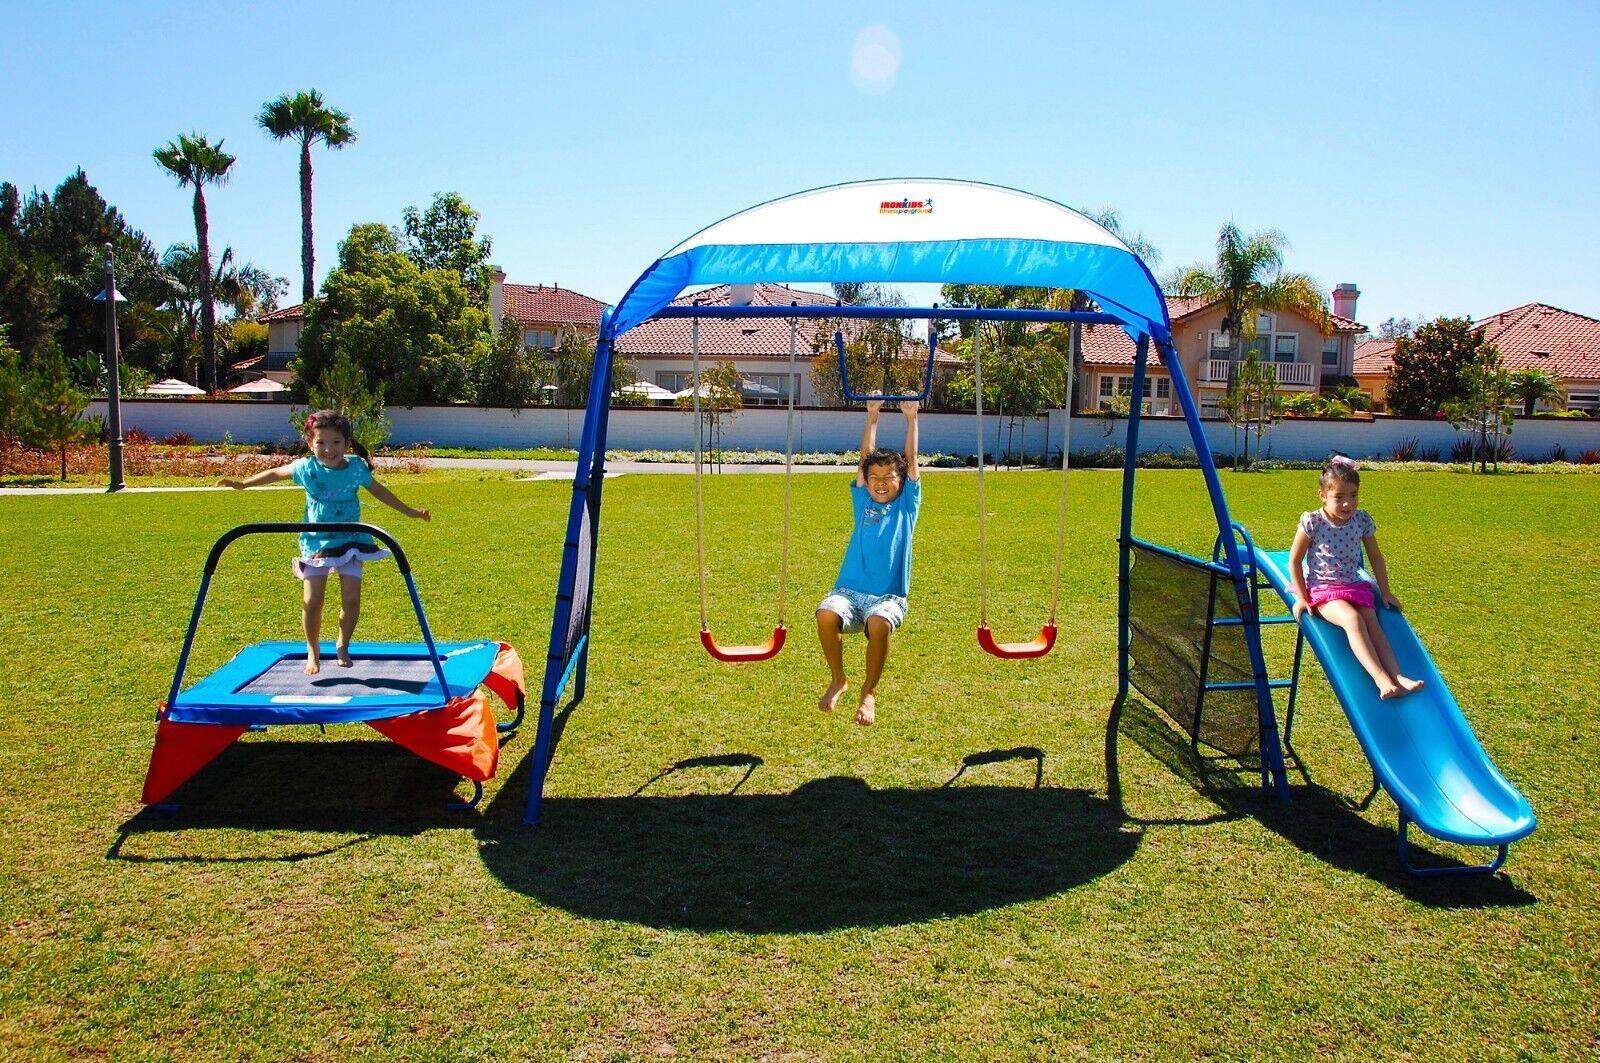 Fitness Playground Metal Swing Set Trampoline Trampoline Trampoline Monkey Bar Slide Shaded Summer New 11a88f